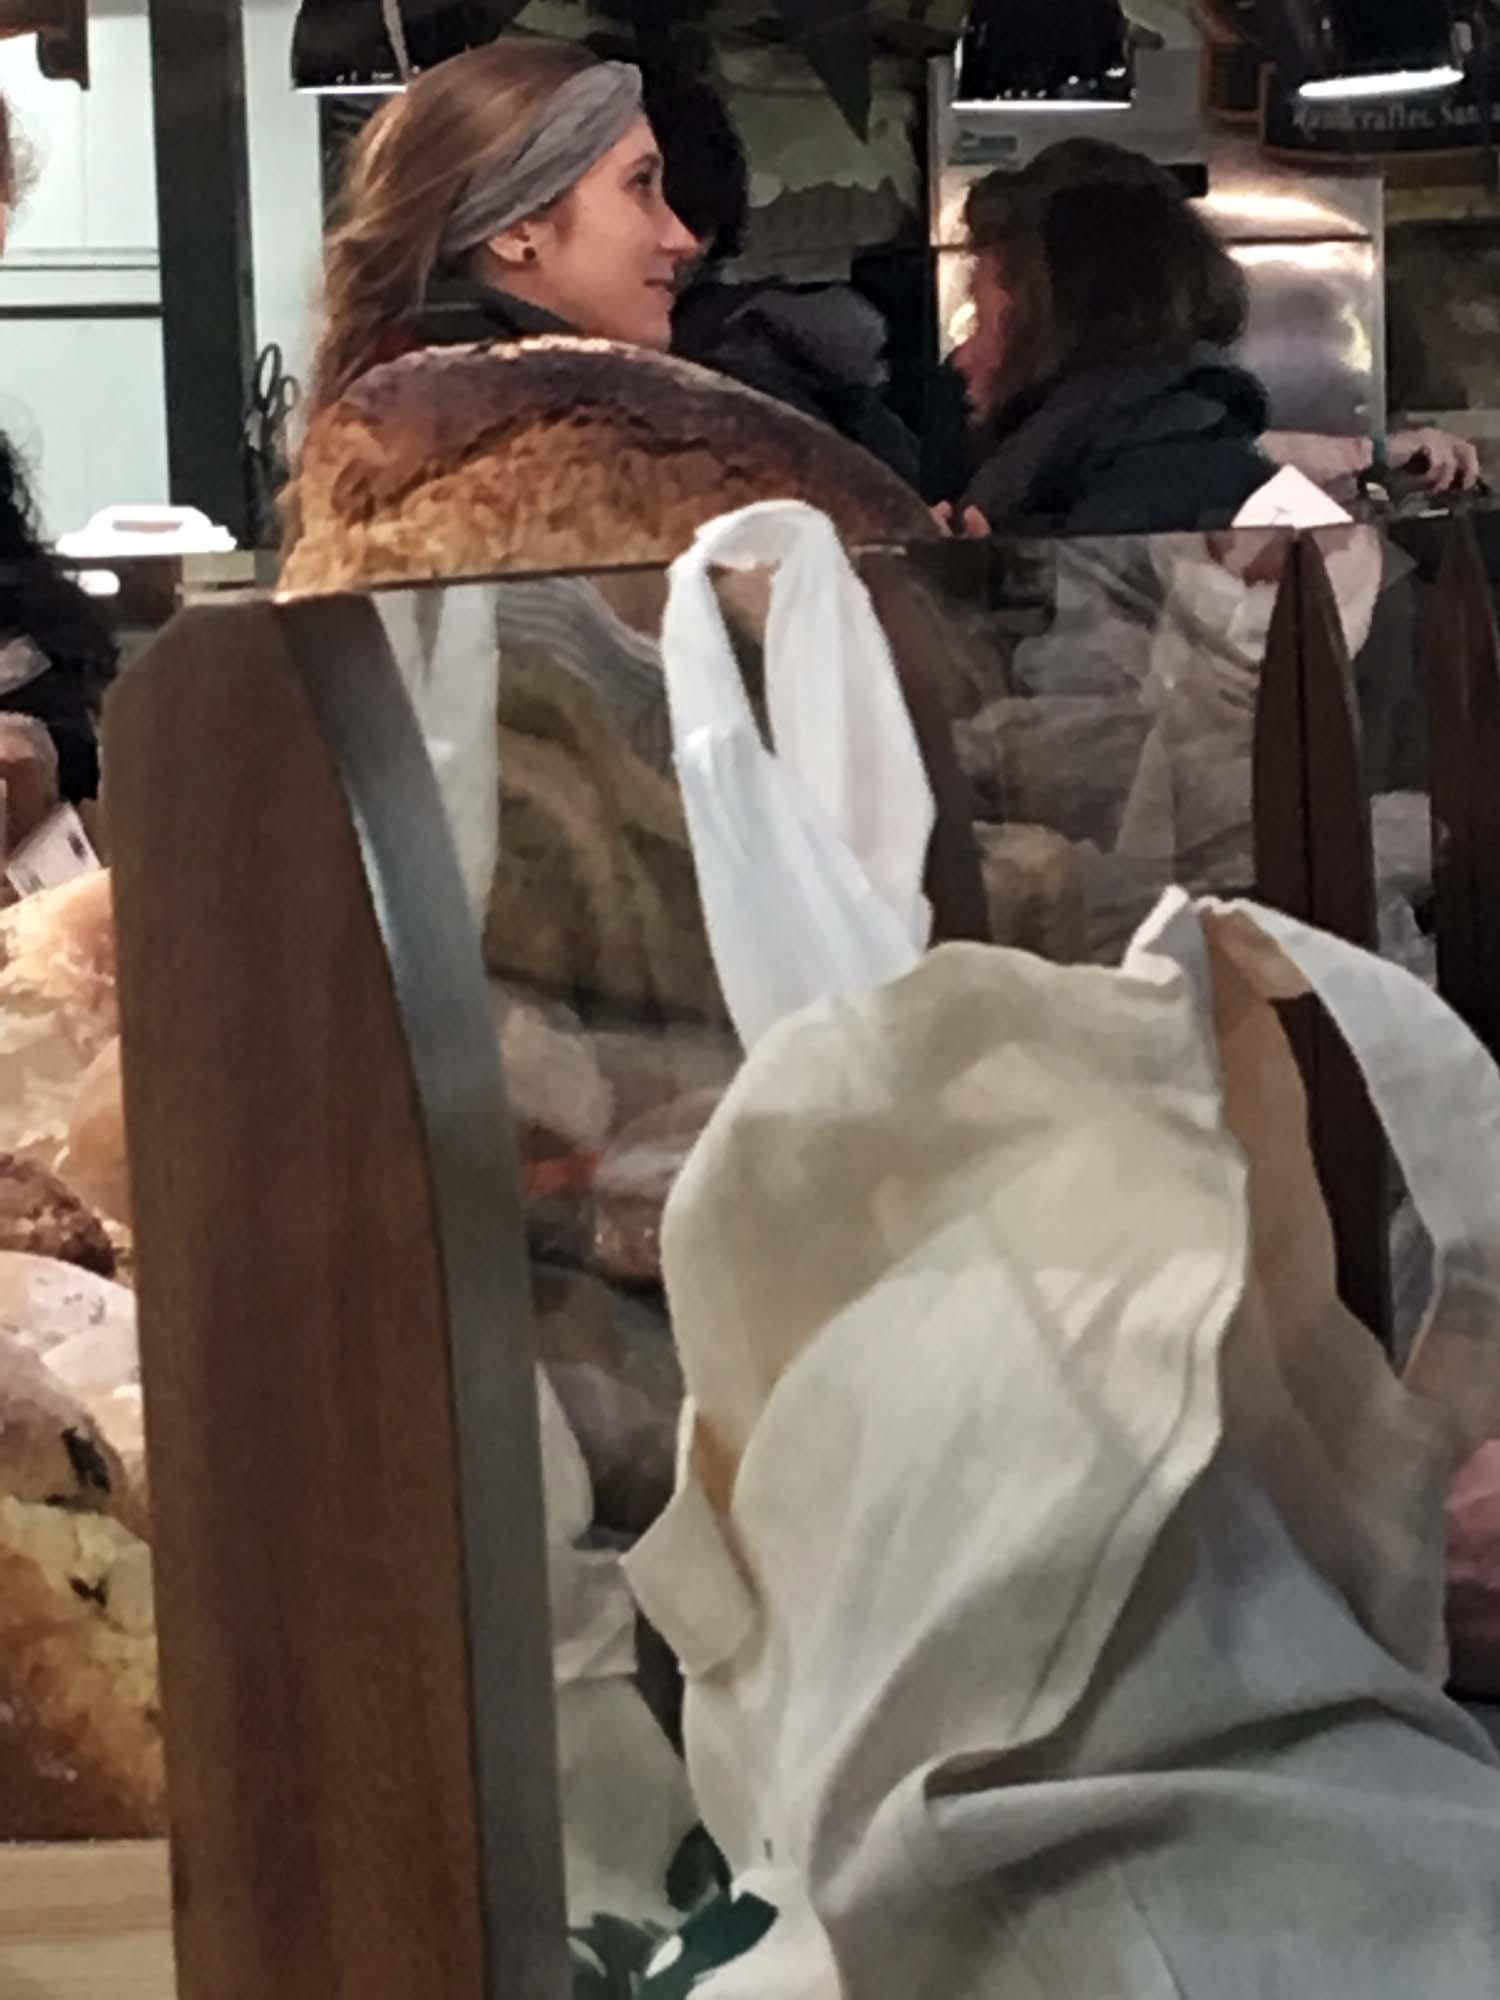 The Woman in Bread